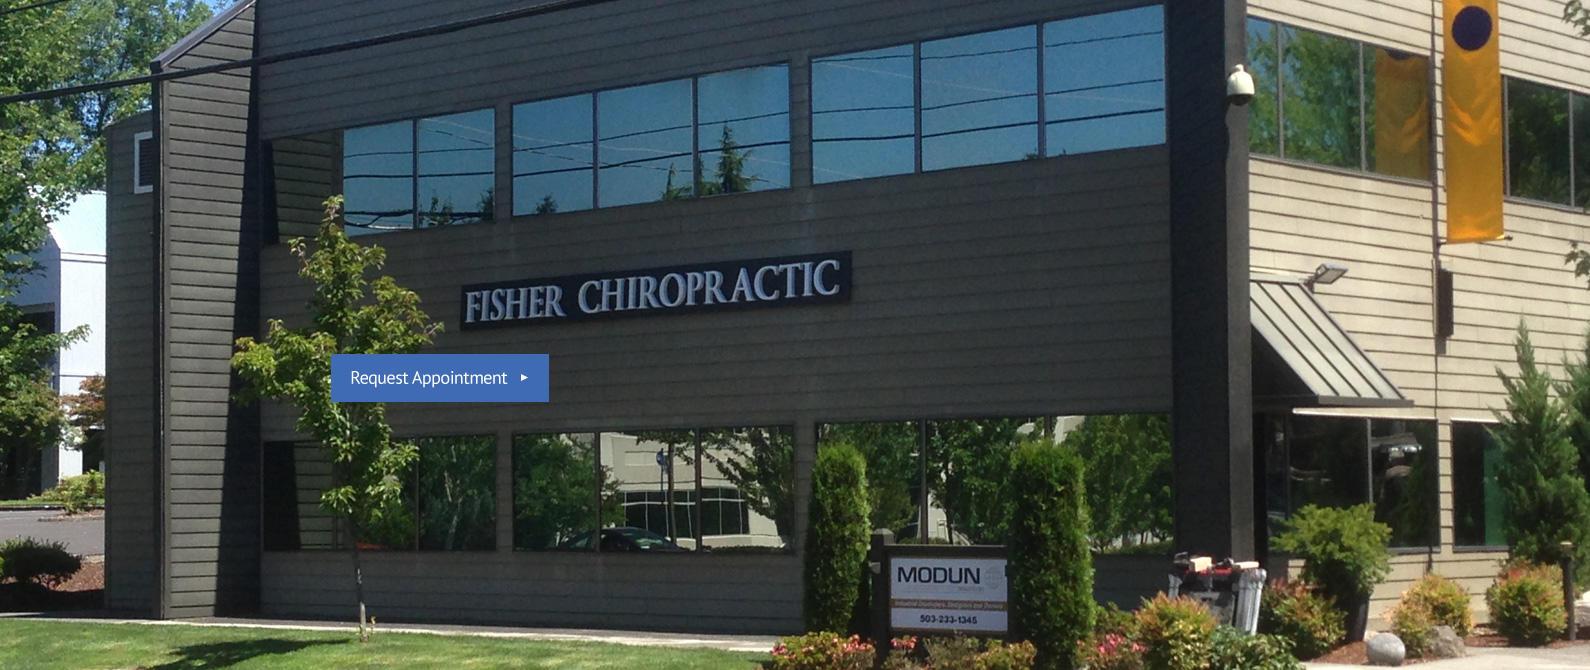 Fisher Chiropractic image 4